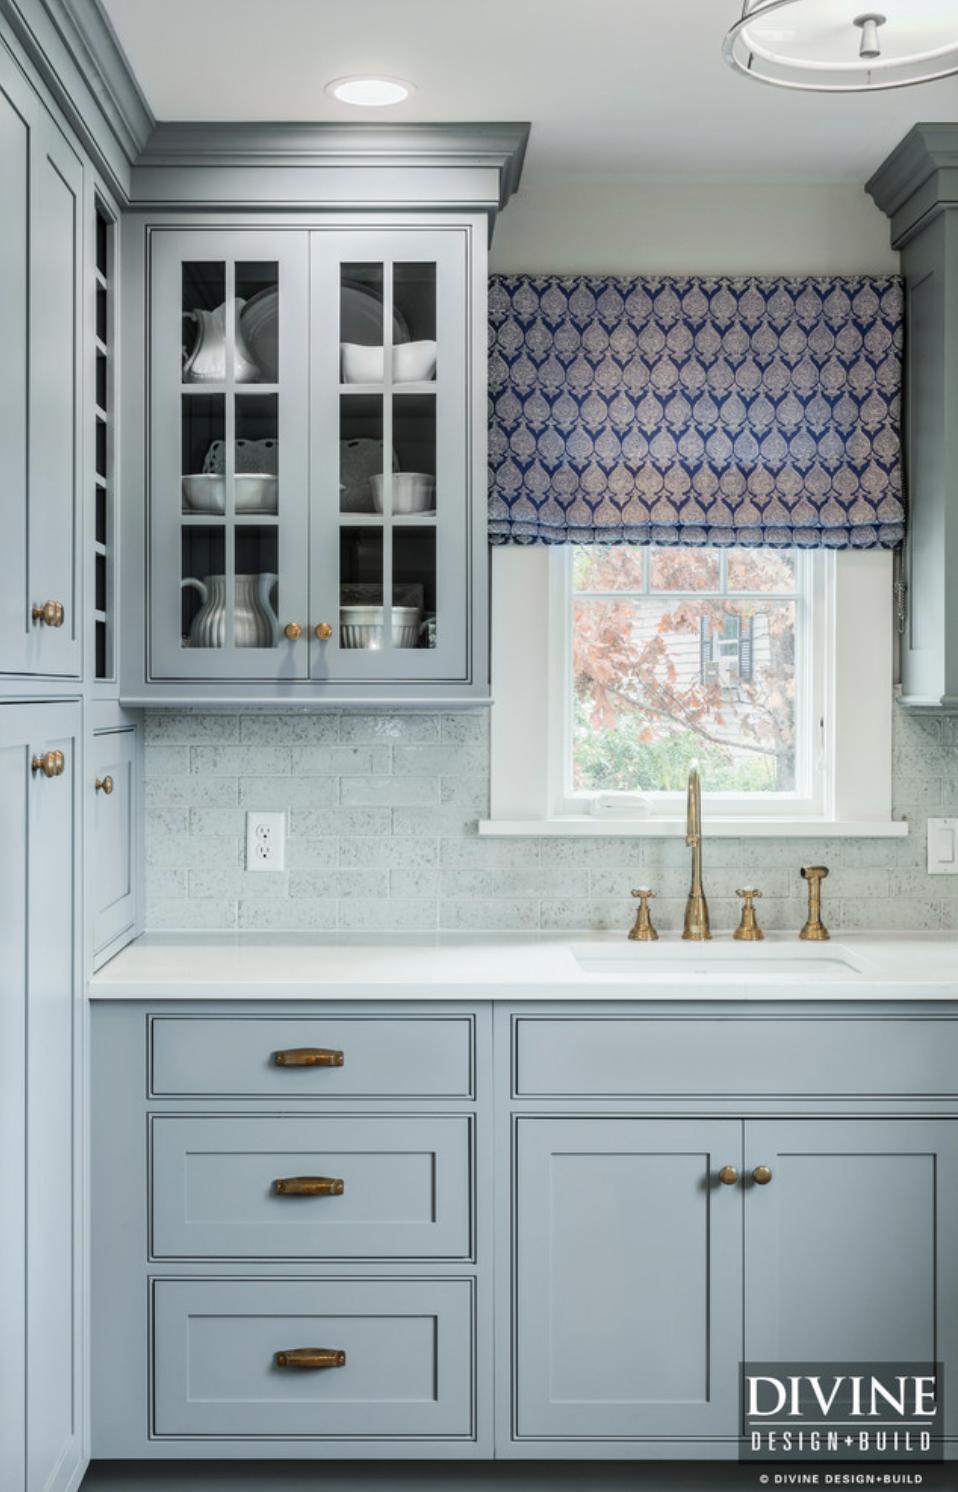 8 Pictures of Kitchens With Subway Tile Backsplashes — Divine Design ...